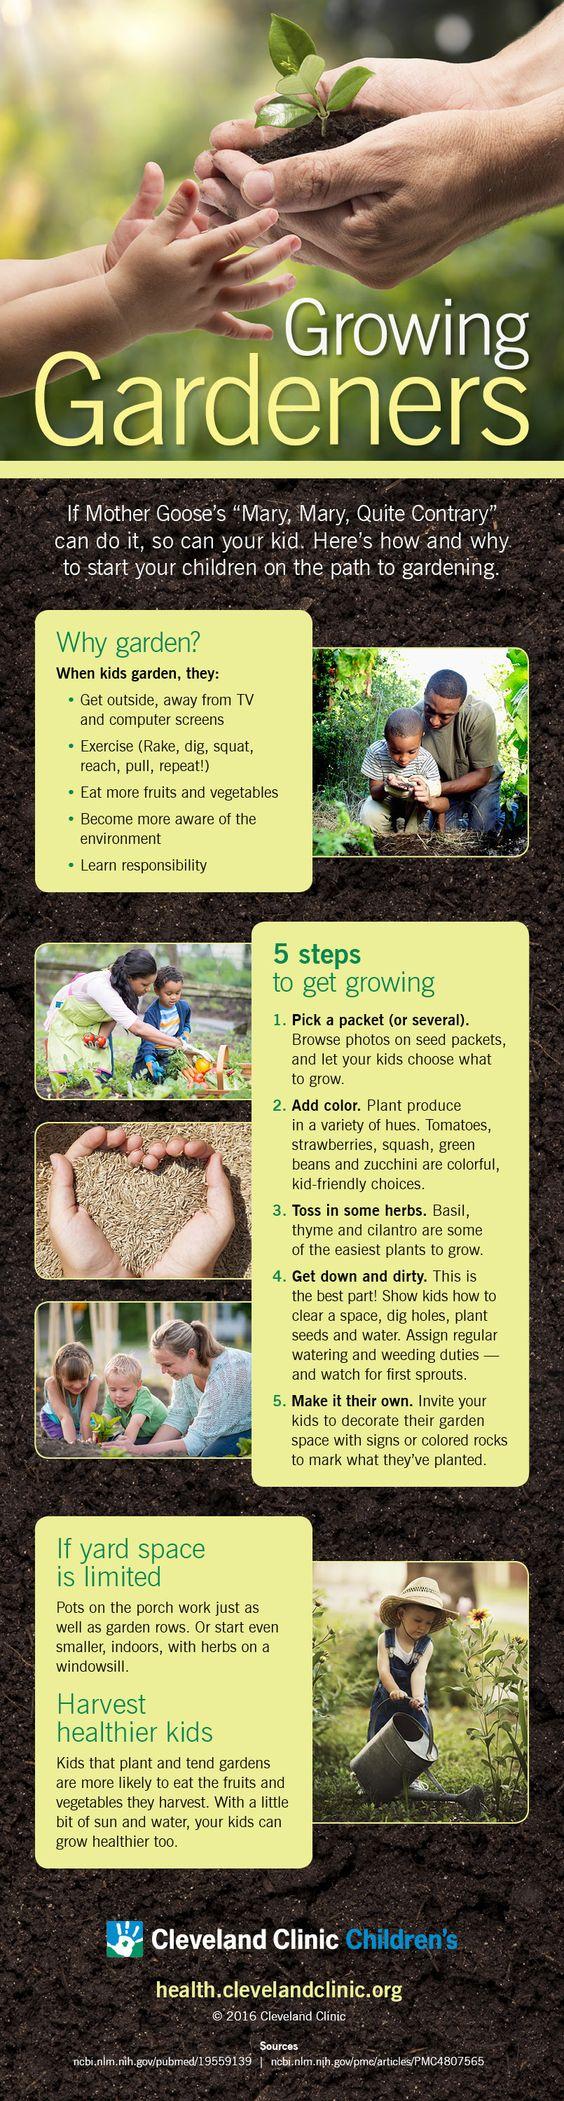 gardening-with-kids-30